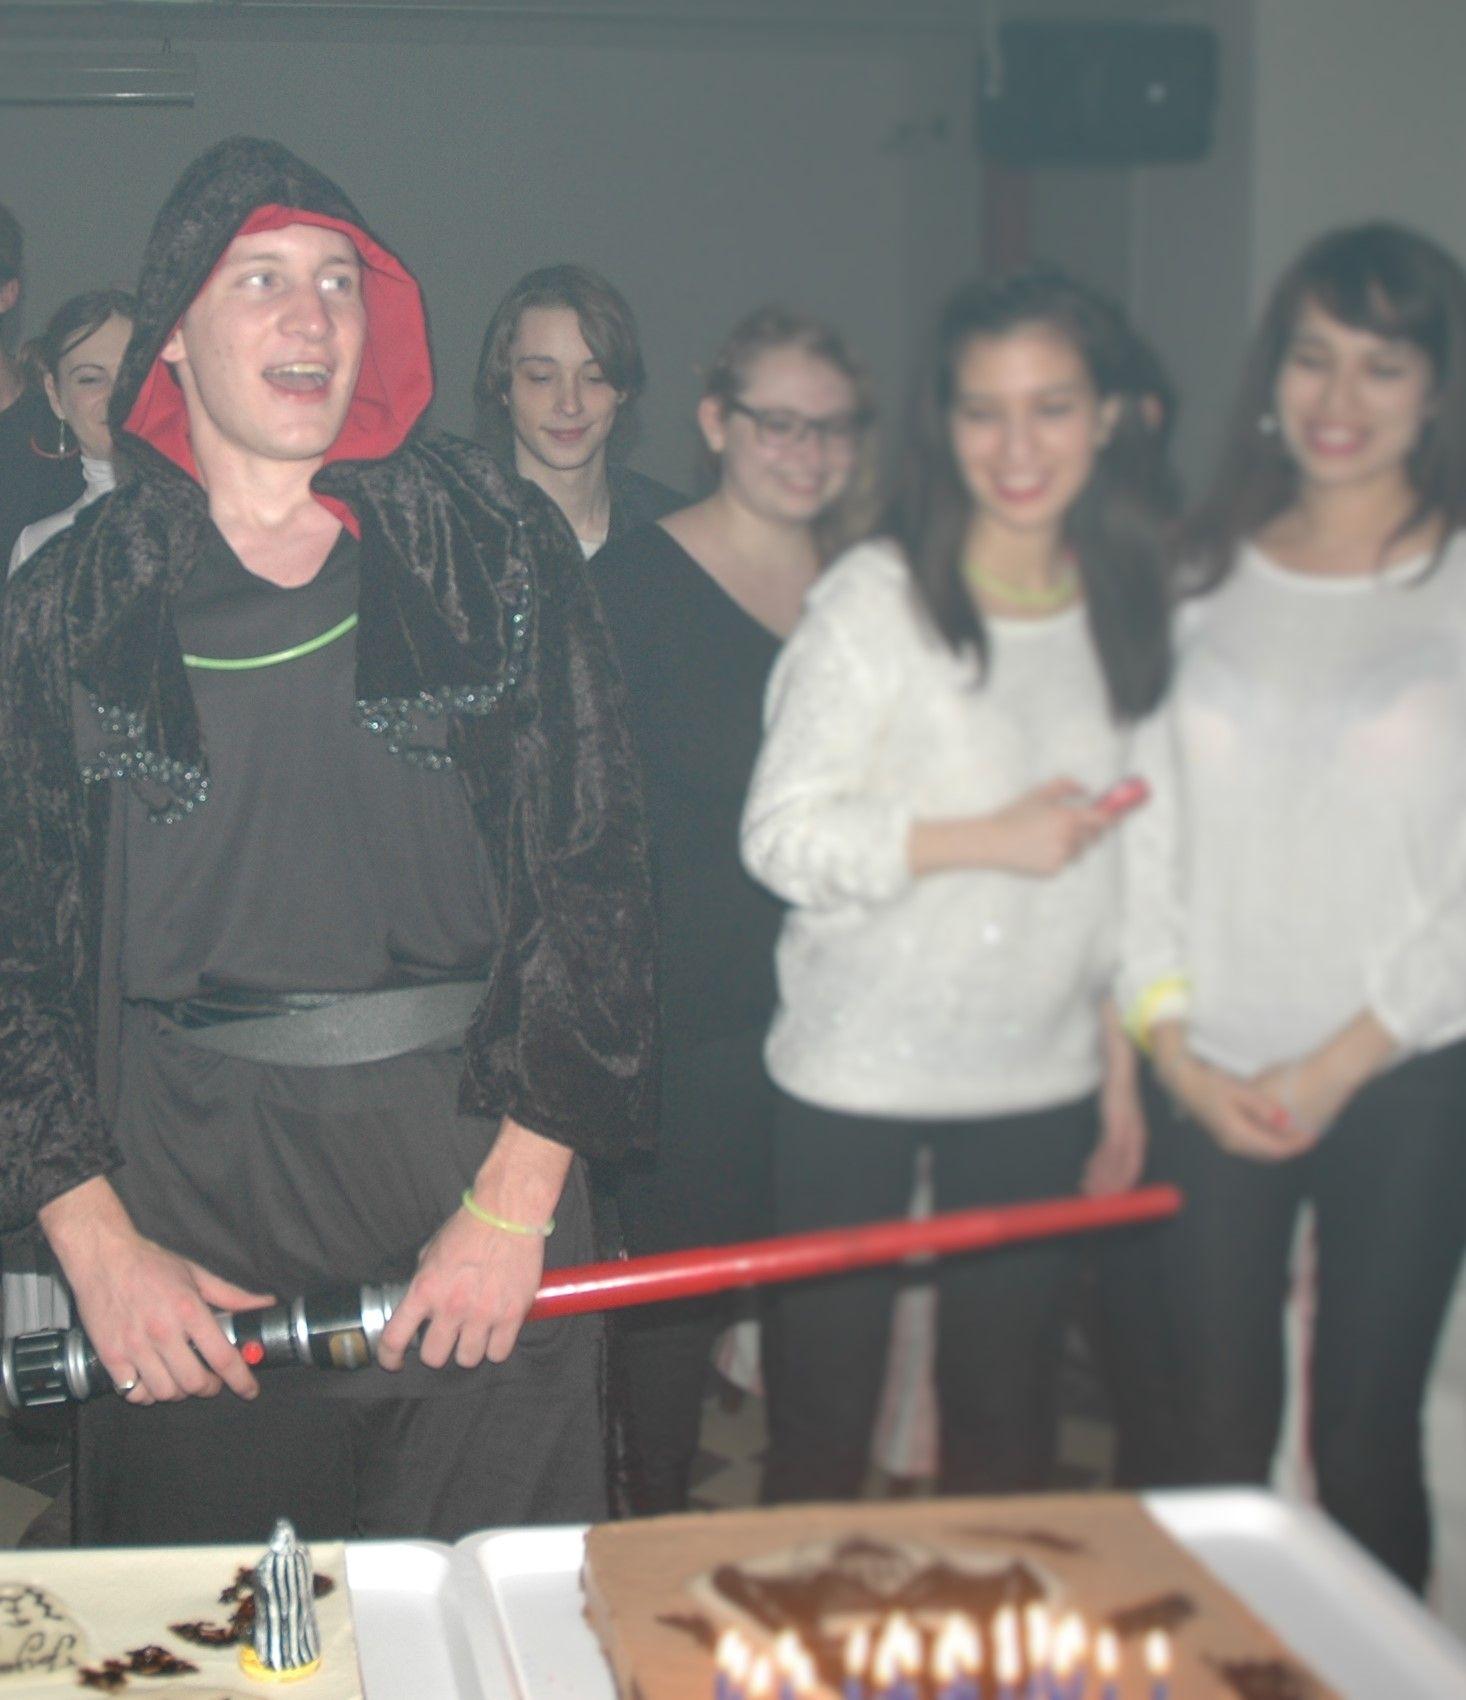 #anniversaire #20ans #starswars #costumés #delaolivapolyne #pensee-event.com